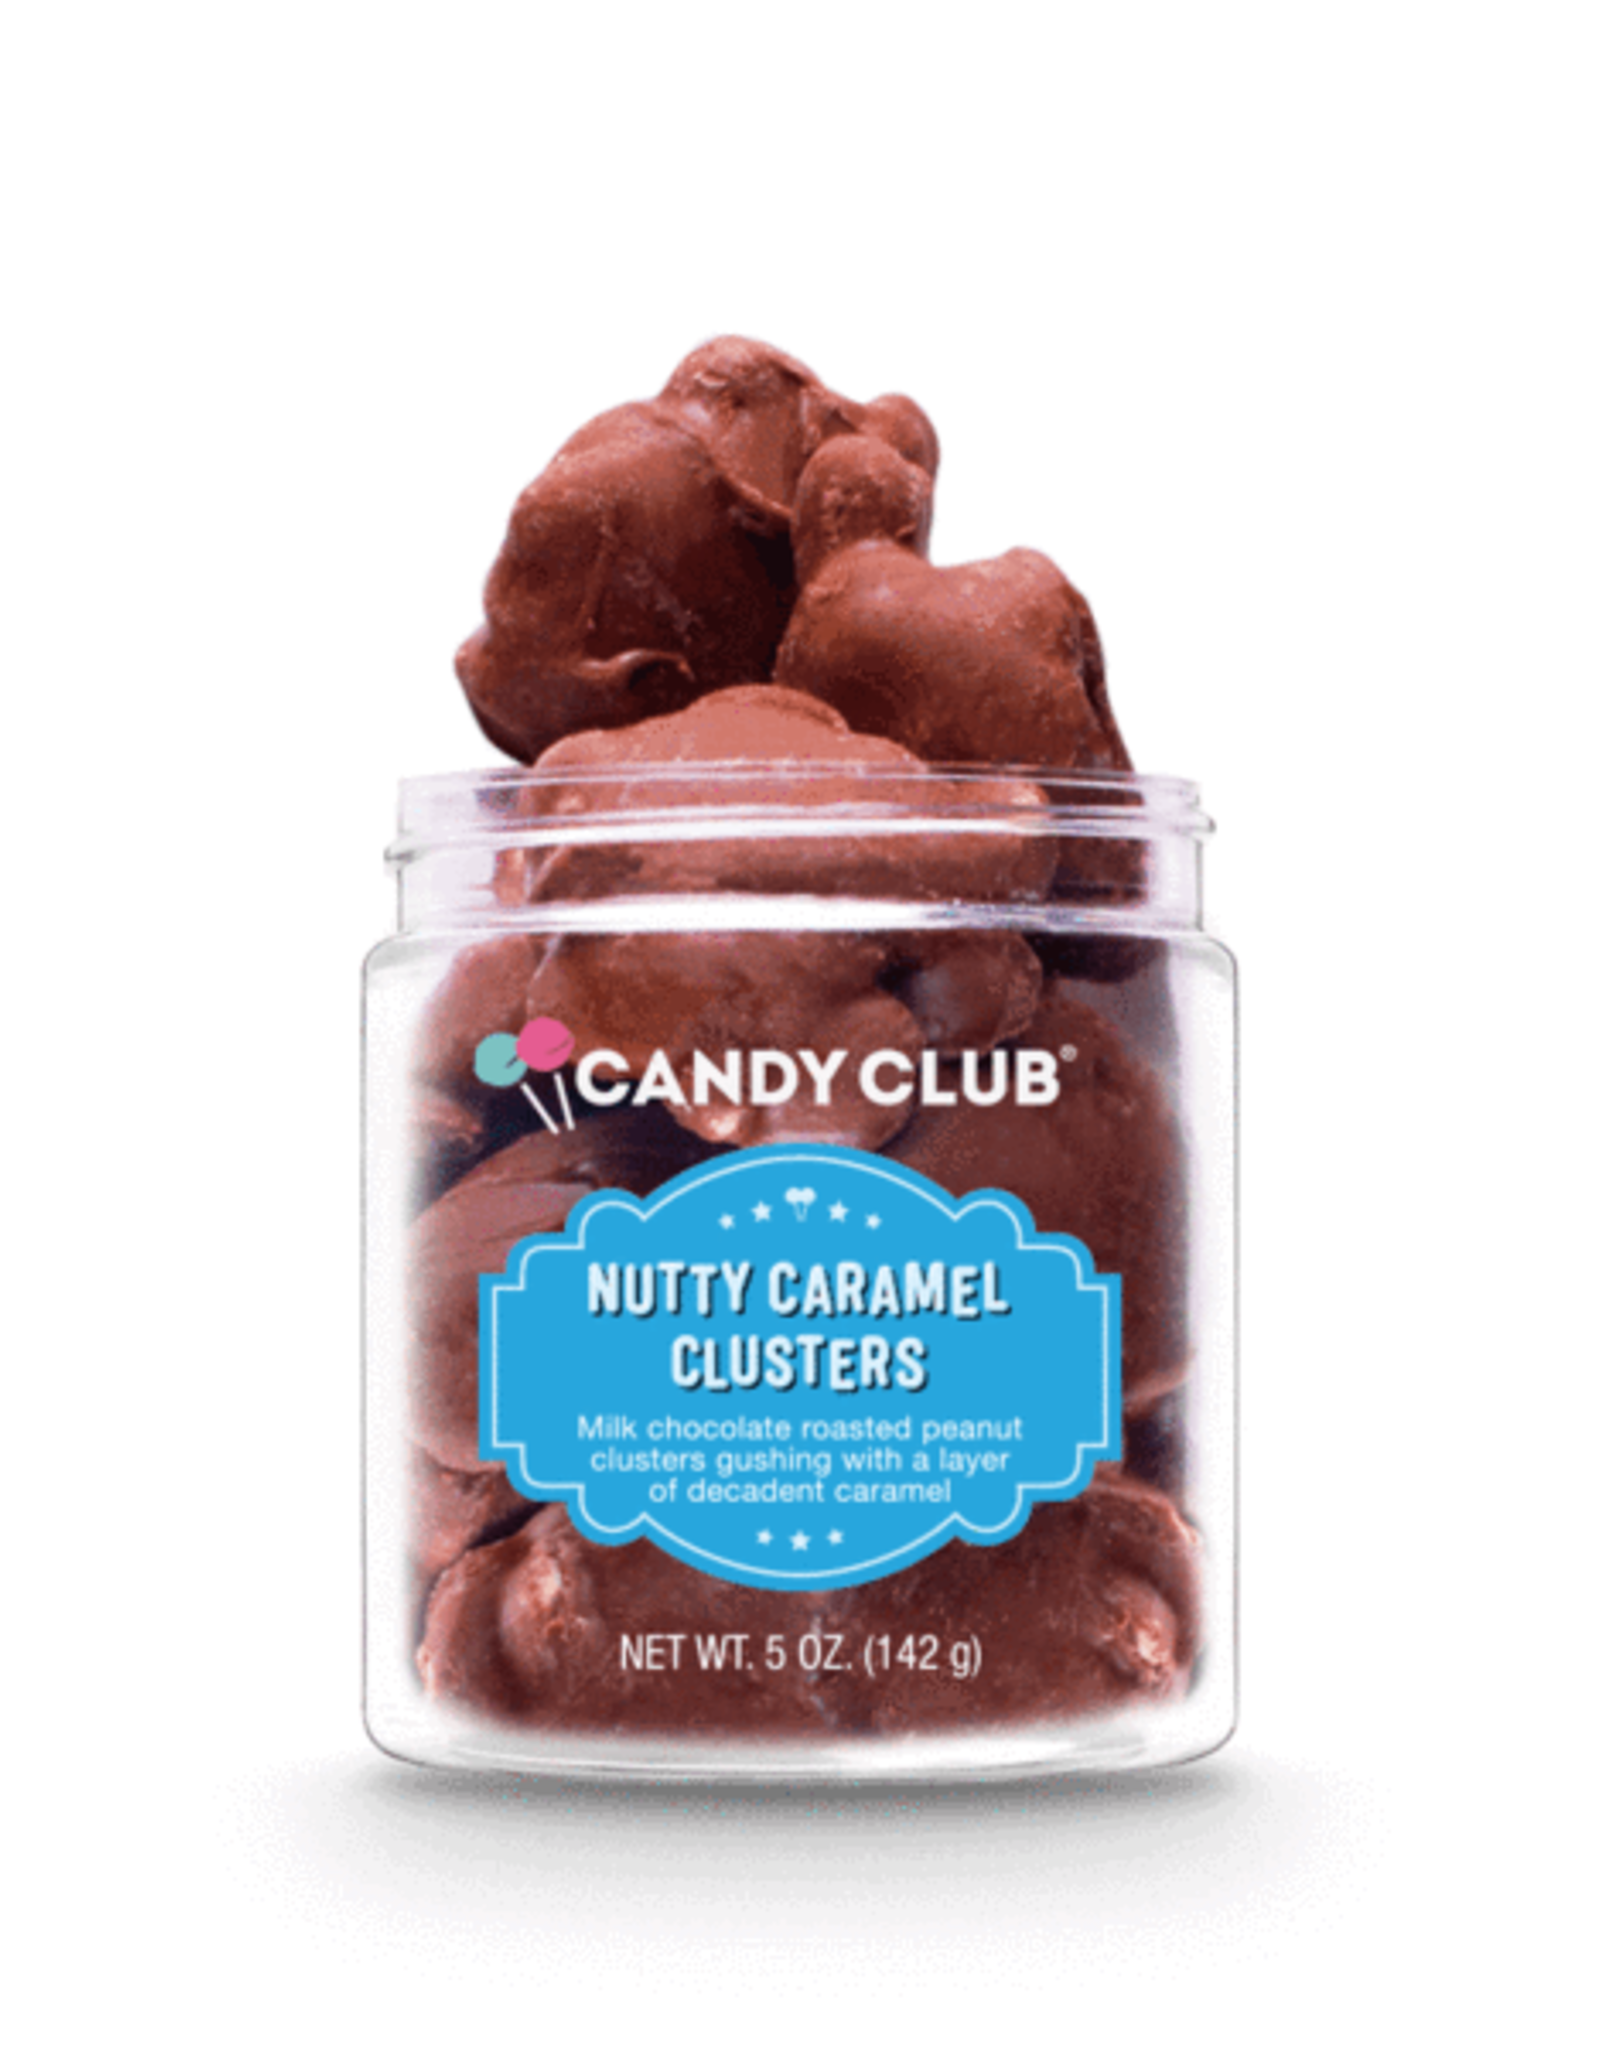 Candy Club nutty caramel clusters